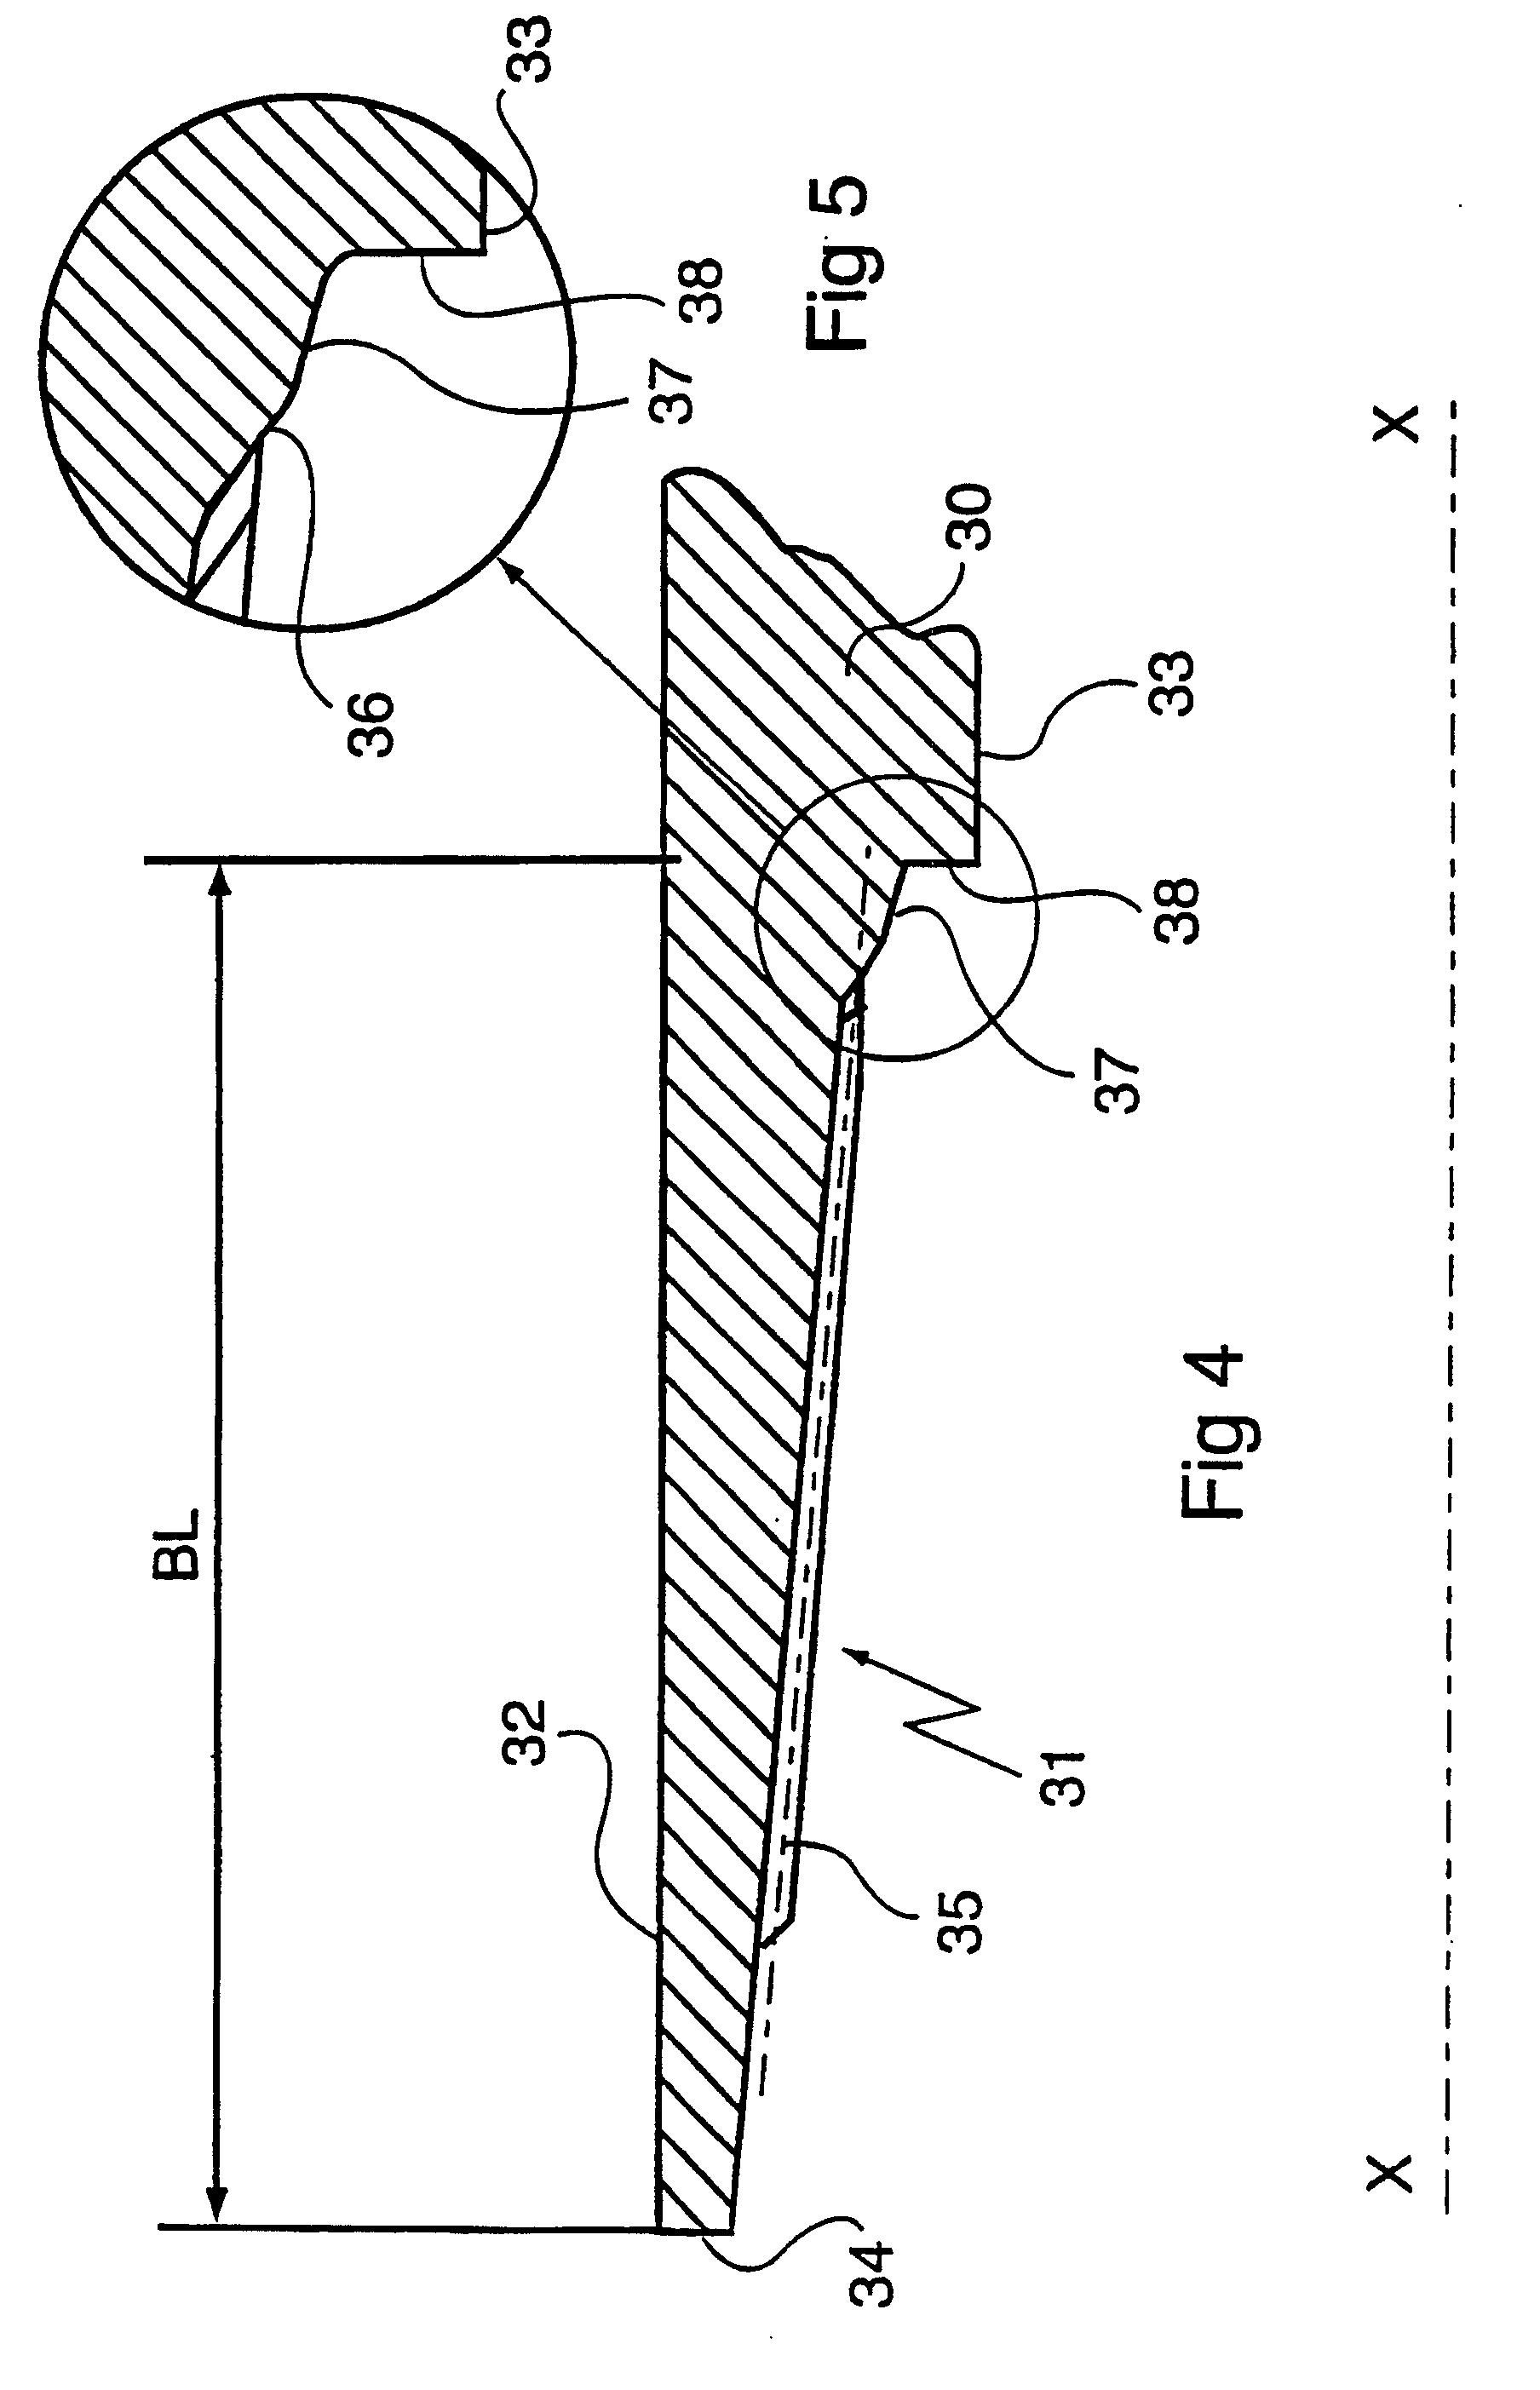 patent ep1121553b1 assemblage filete integral de deux tubes metalliques google patents. Black Bedroom Furniture Sets. Home Design Ideas